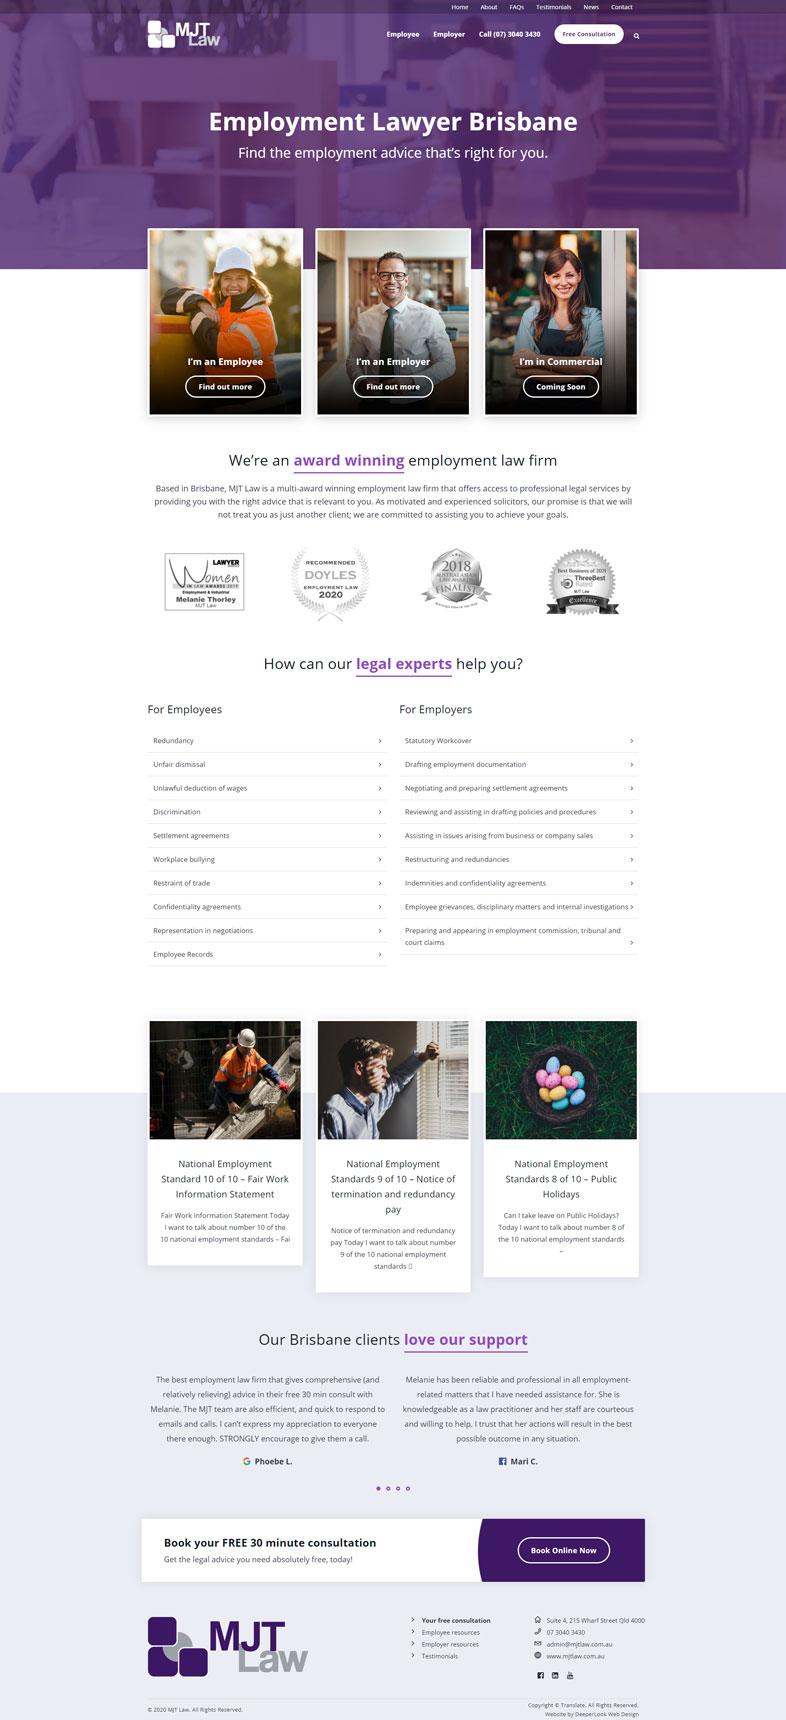 MJT Law's website design of the homepage